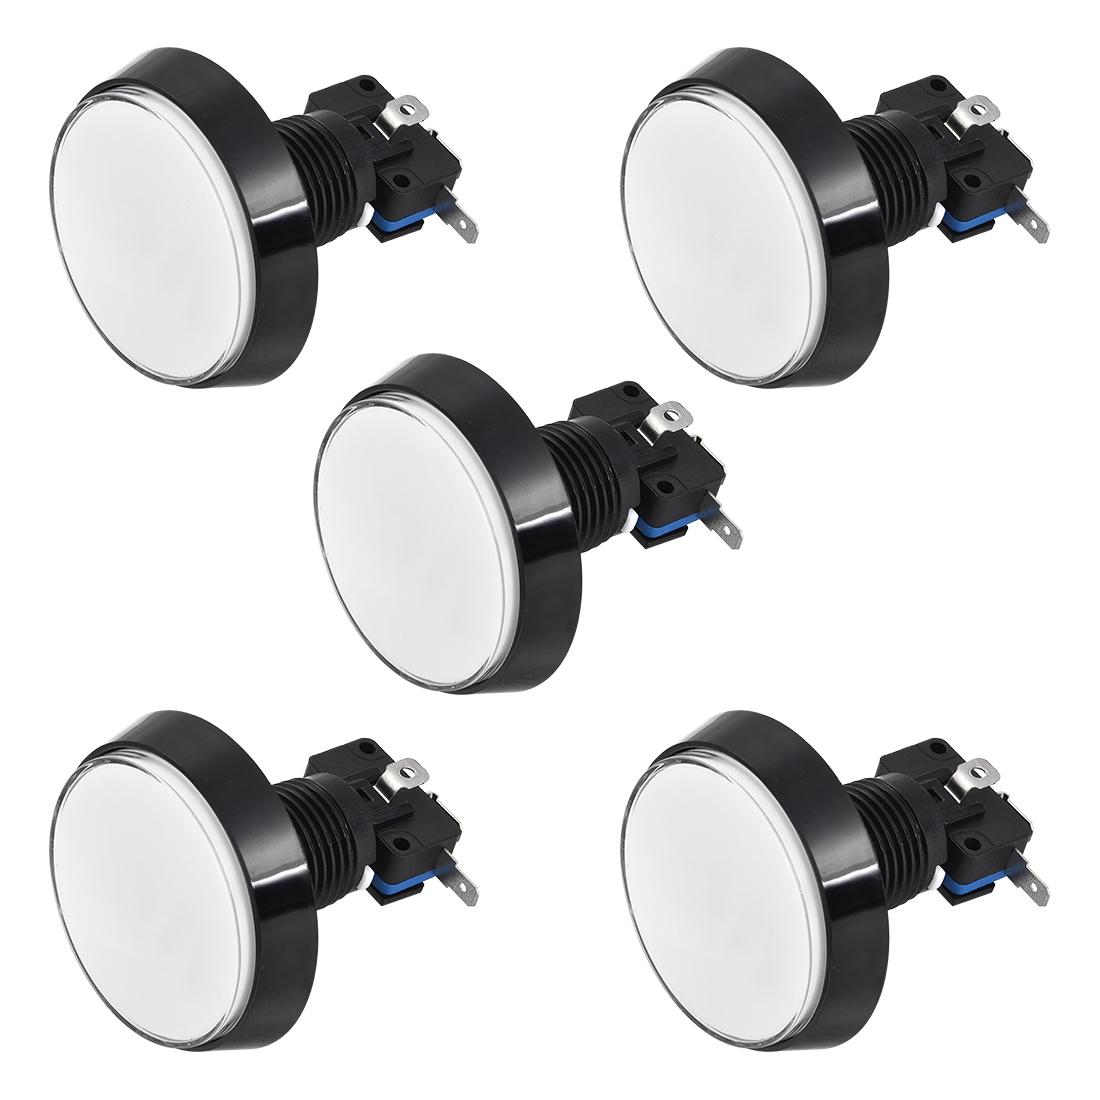 Game Push Button 60mm Round 12V LED Illuminated Push Button Switch White 5pcs